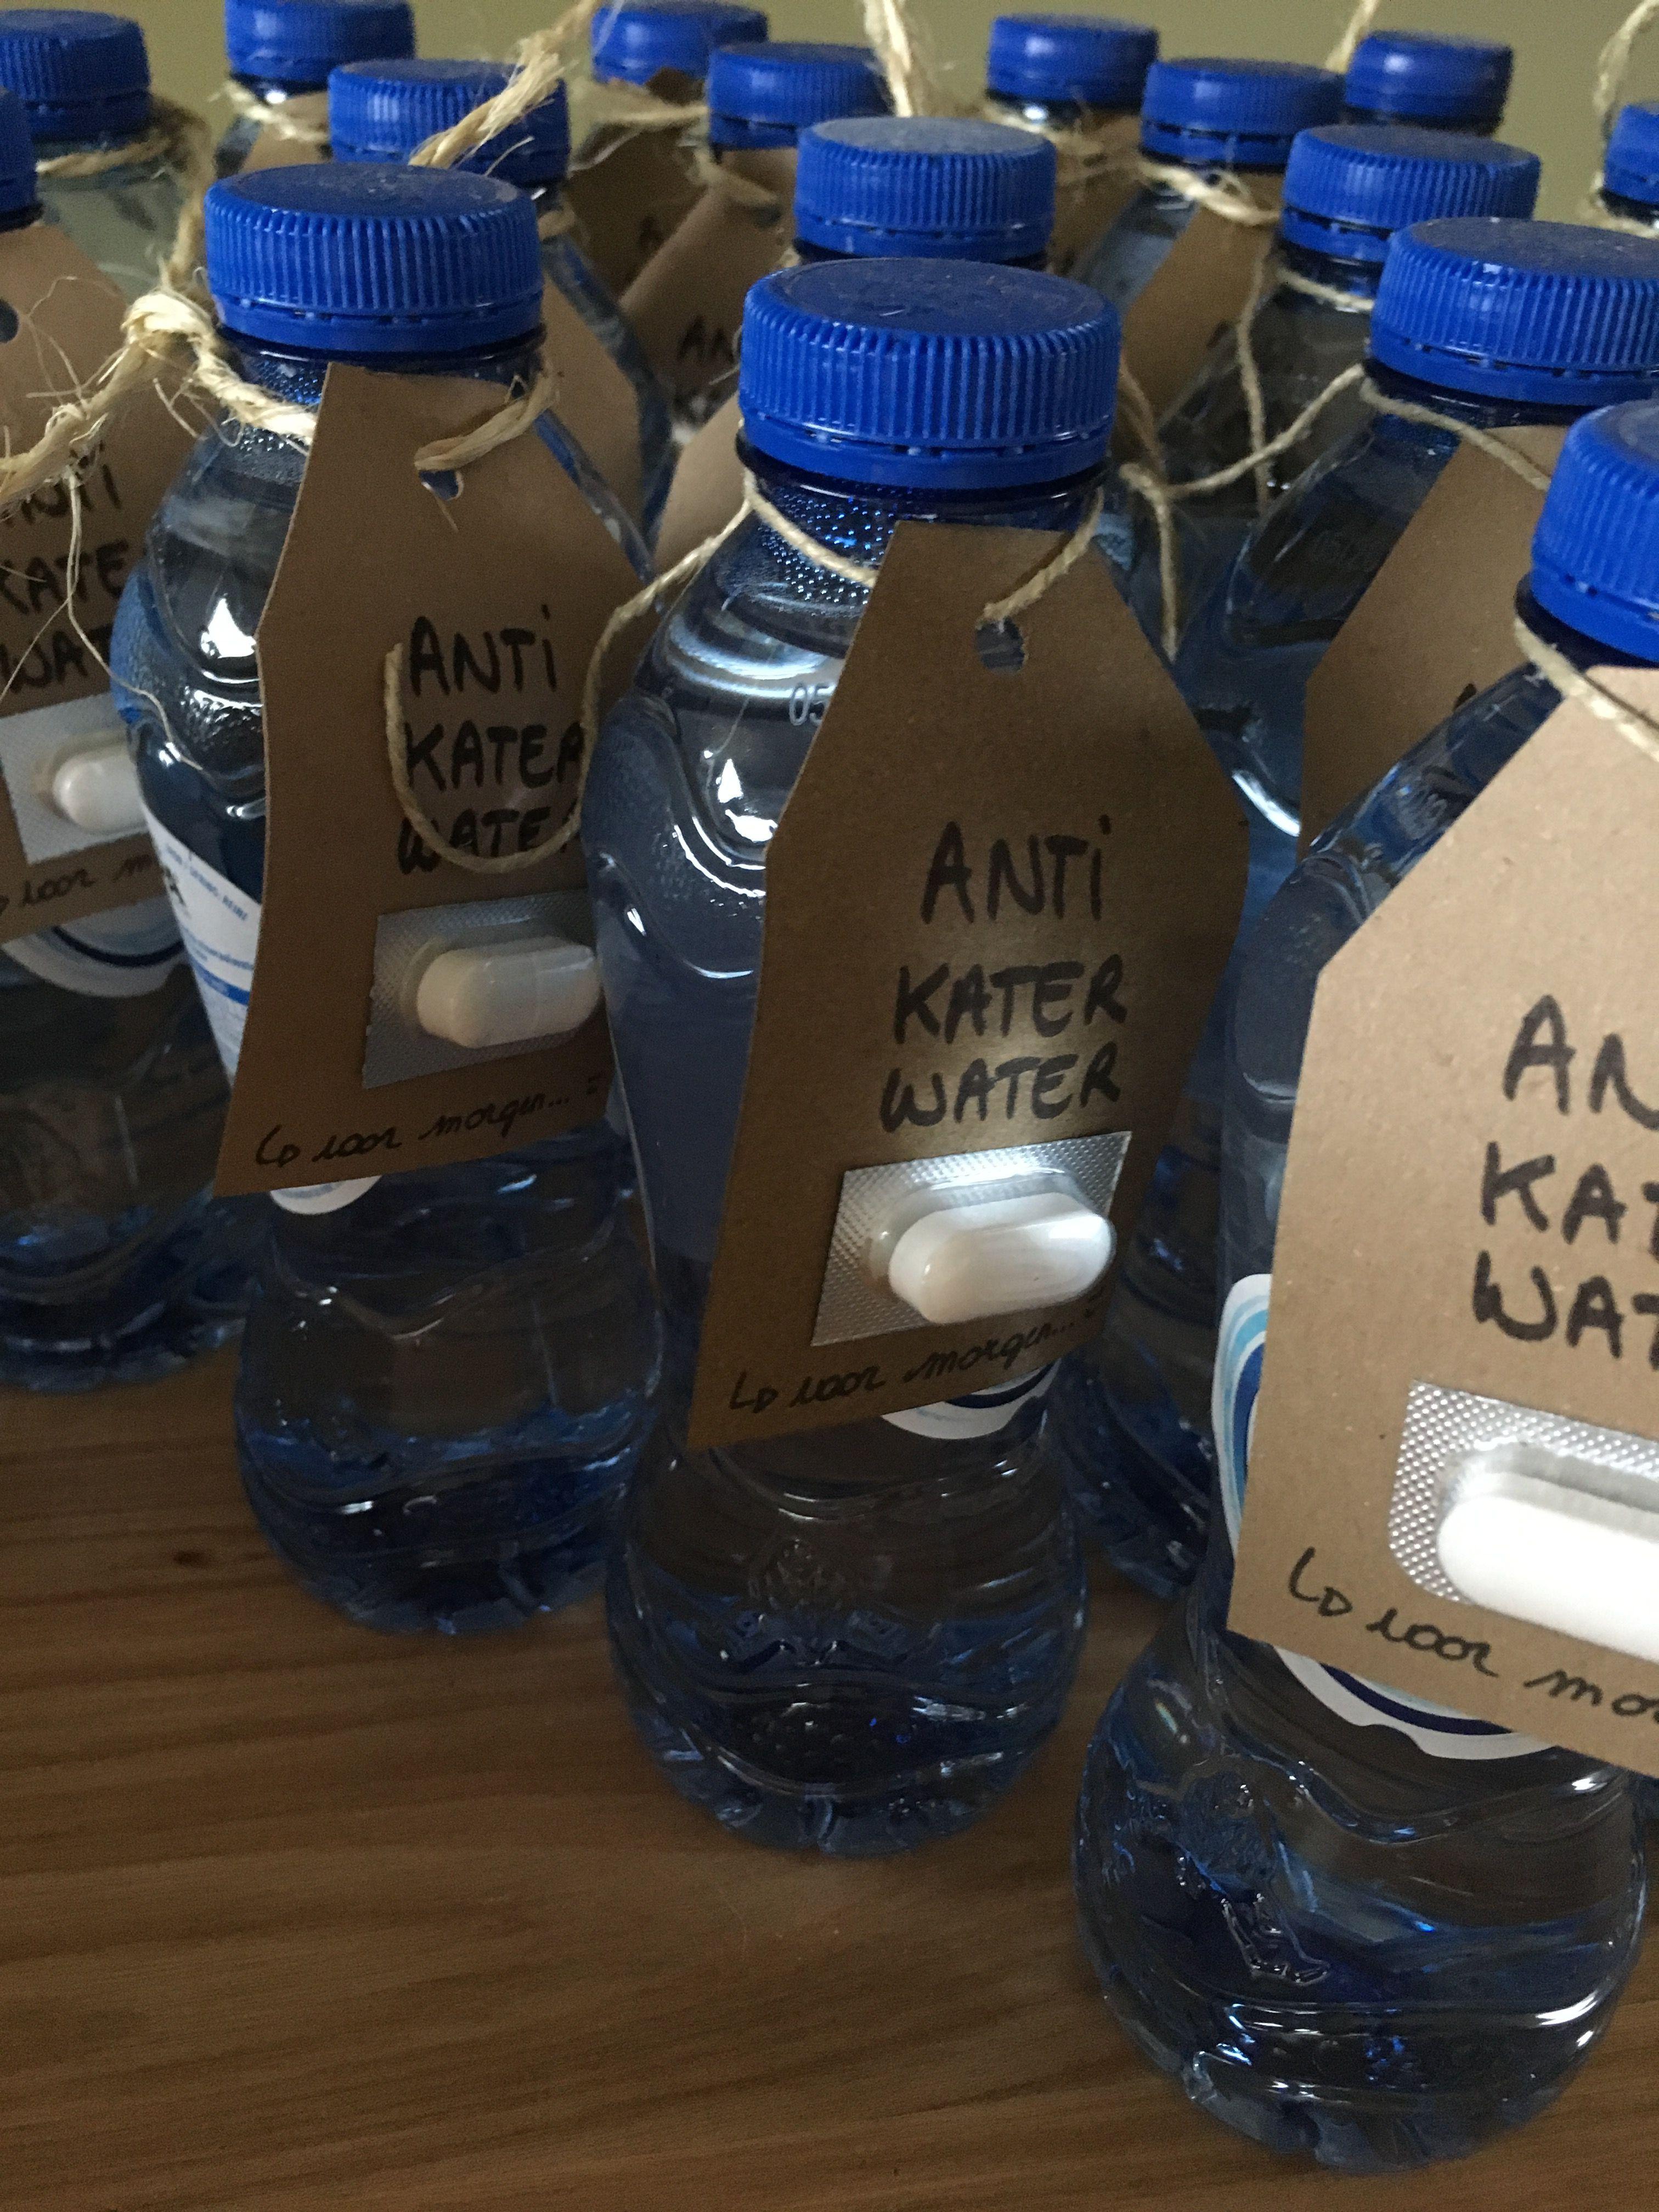 Anti Kater Water Trouwen Bruiloft Trouwen En Water